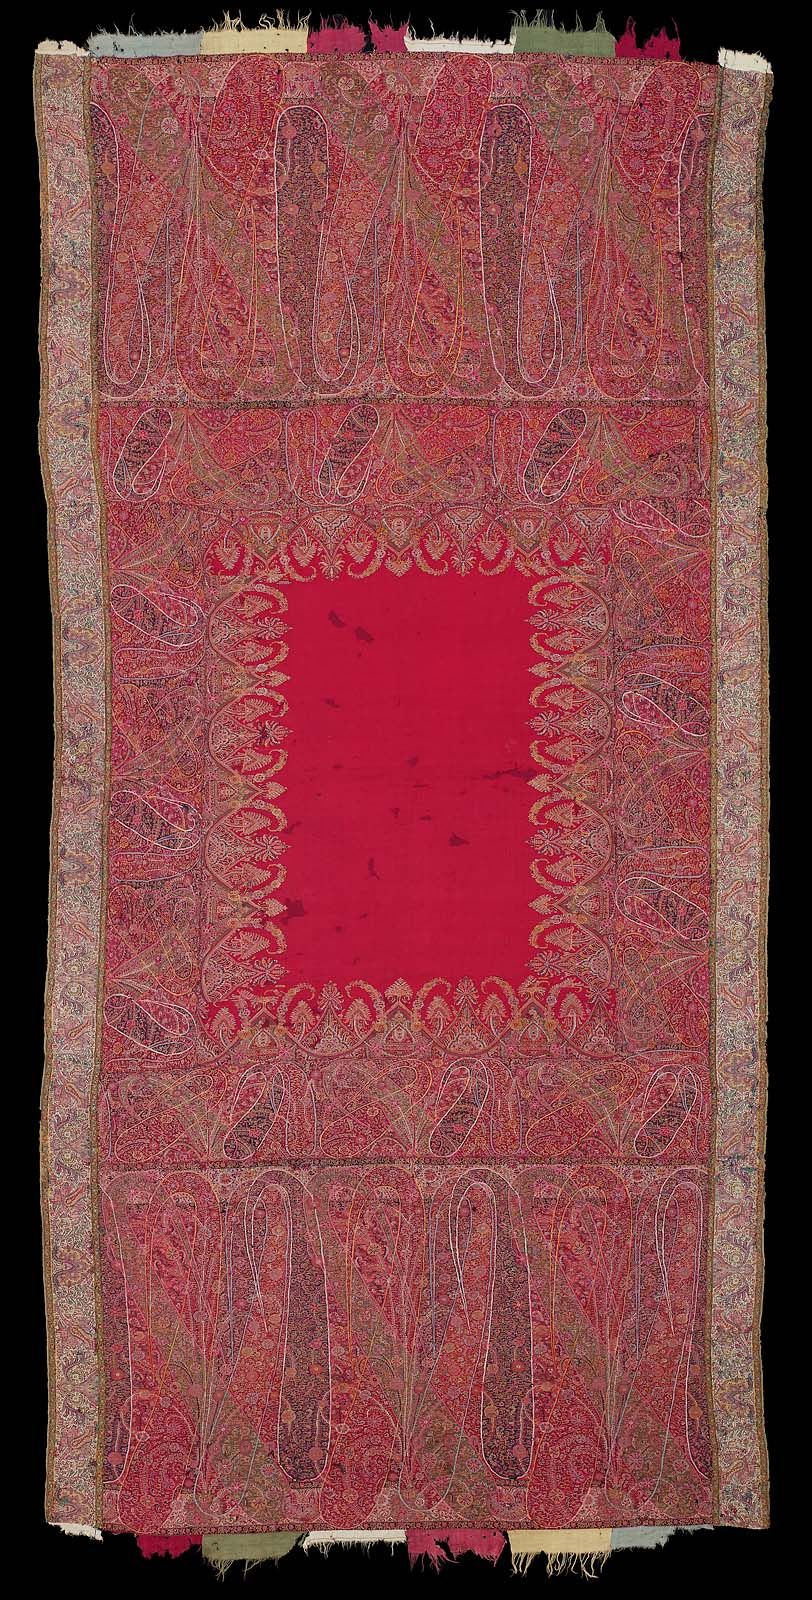 Shawl Digital Print Fabric Weaving Art Kashmiri Shawls